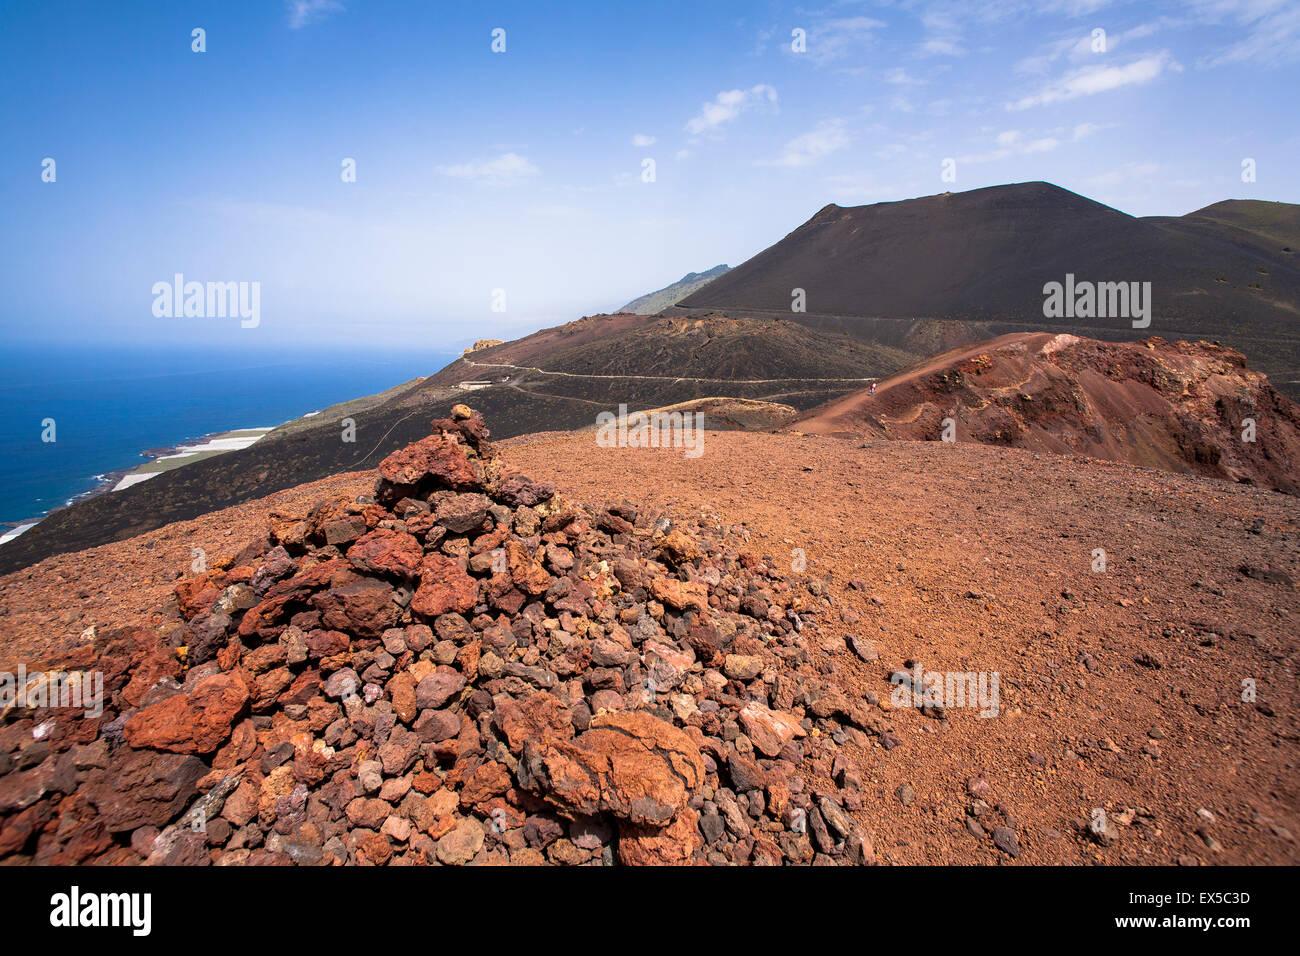 ESP, Spanien, die Kanaren Insel La Palma, Blick vom Vulkan Teneguia, der Vulkan San Antonio in der Nähe von Stockbild